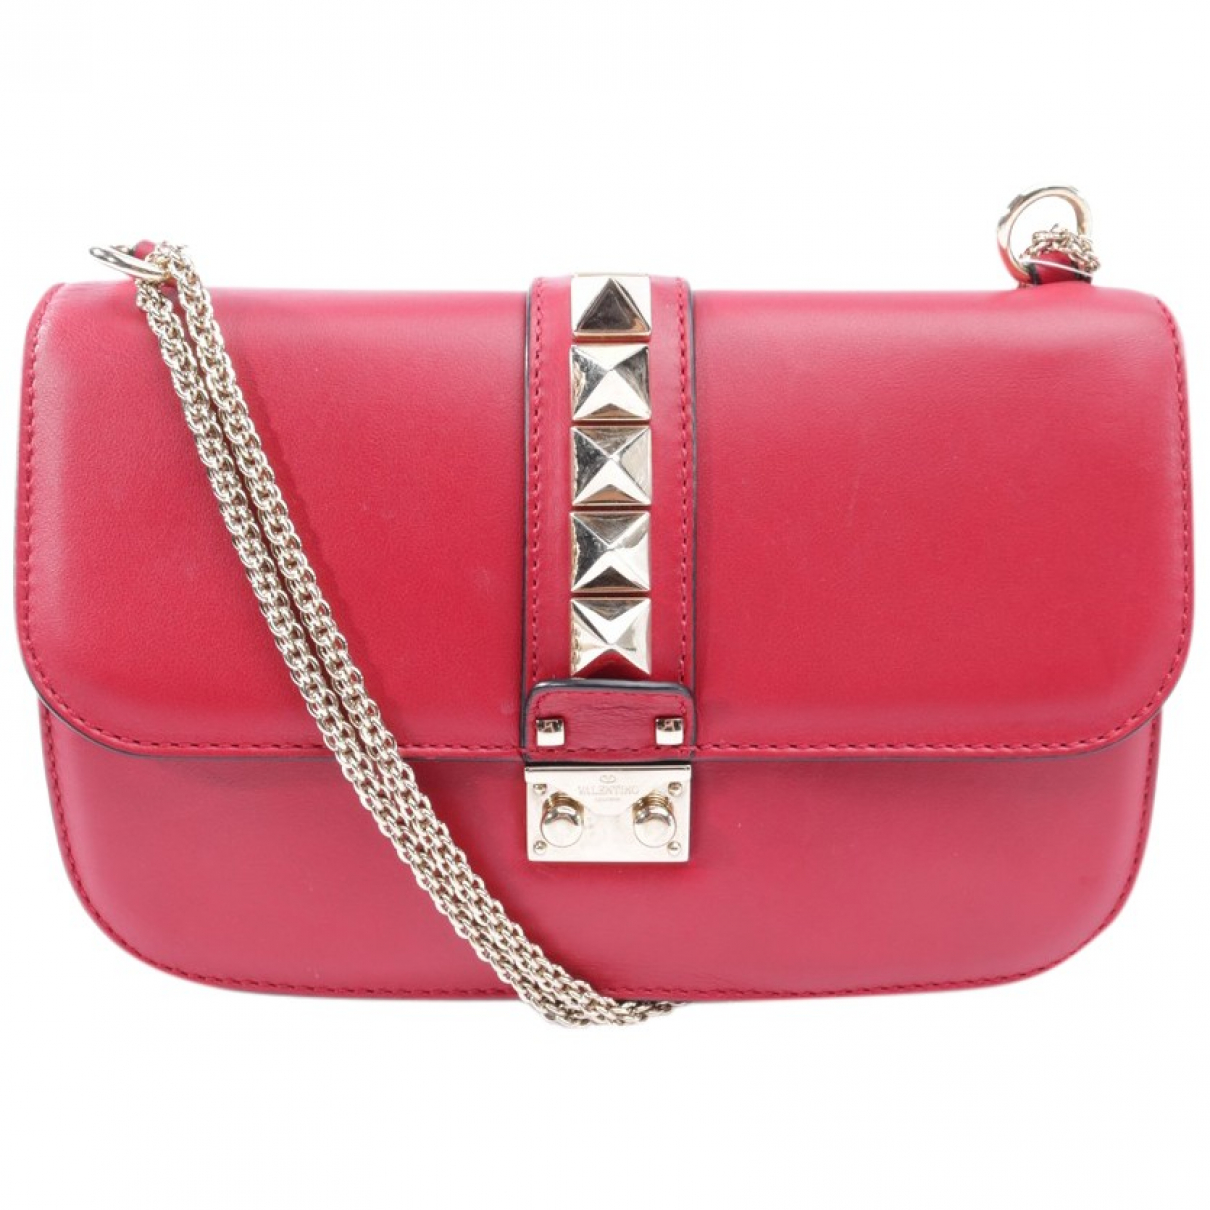 Valentino Garavani Rockstud Red Leather Clutch bag for Women \N